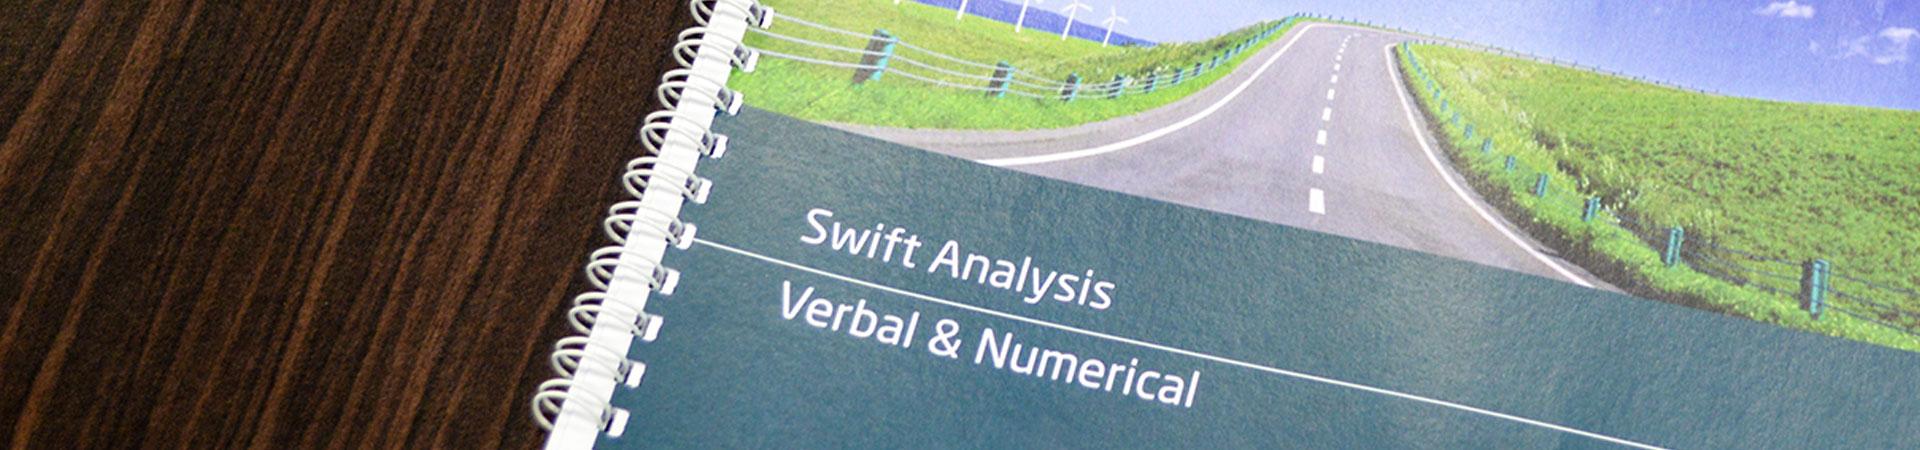 swift analysis aptitude test example